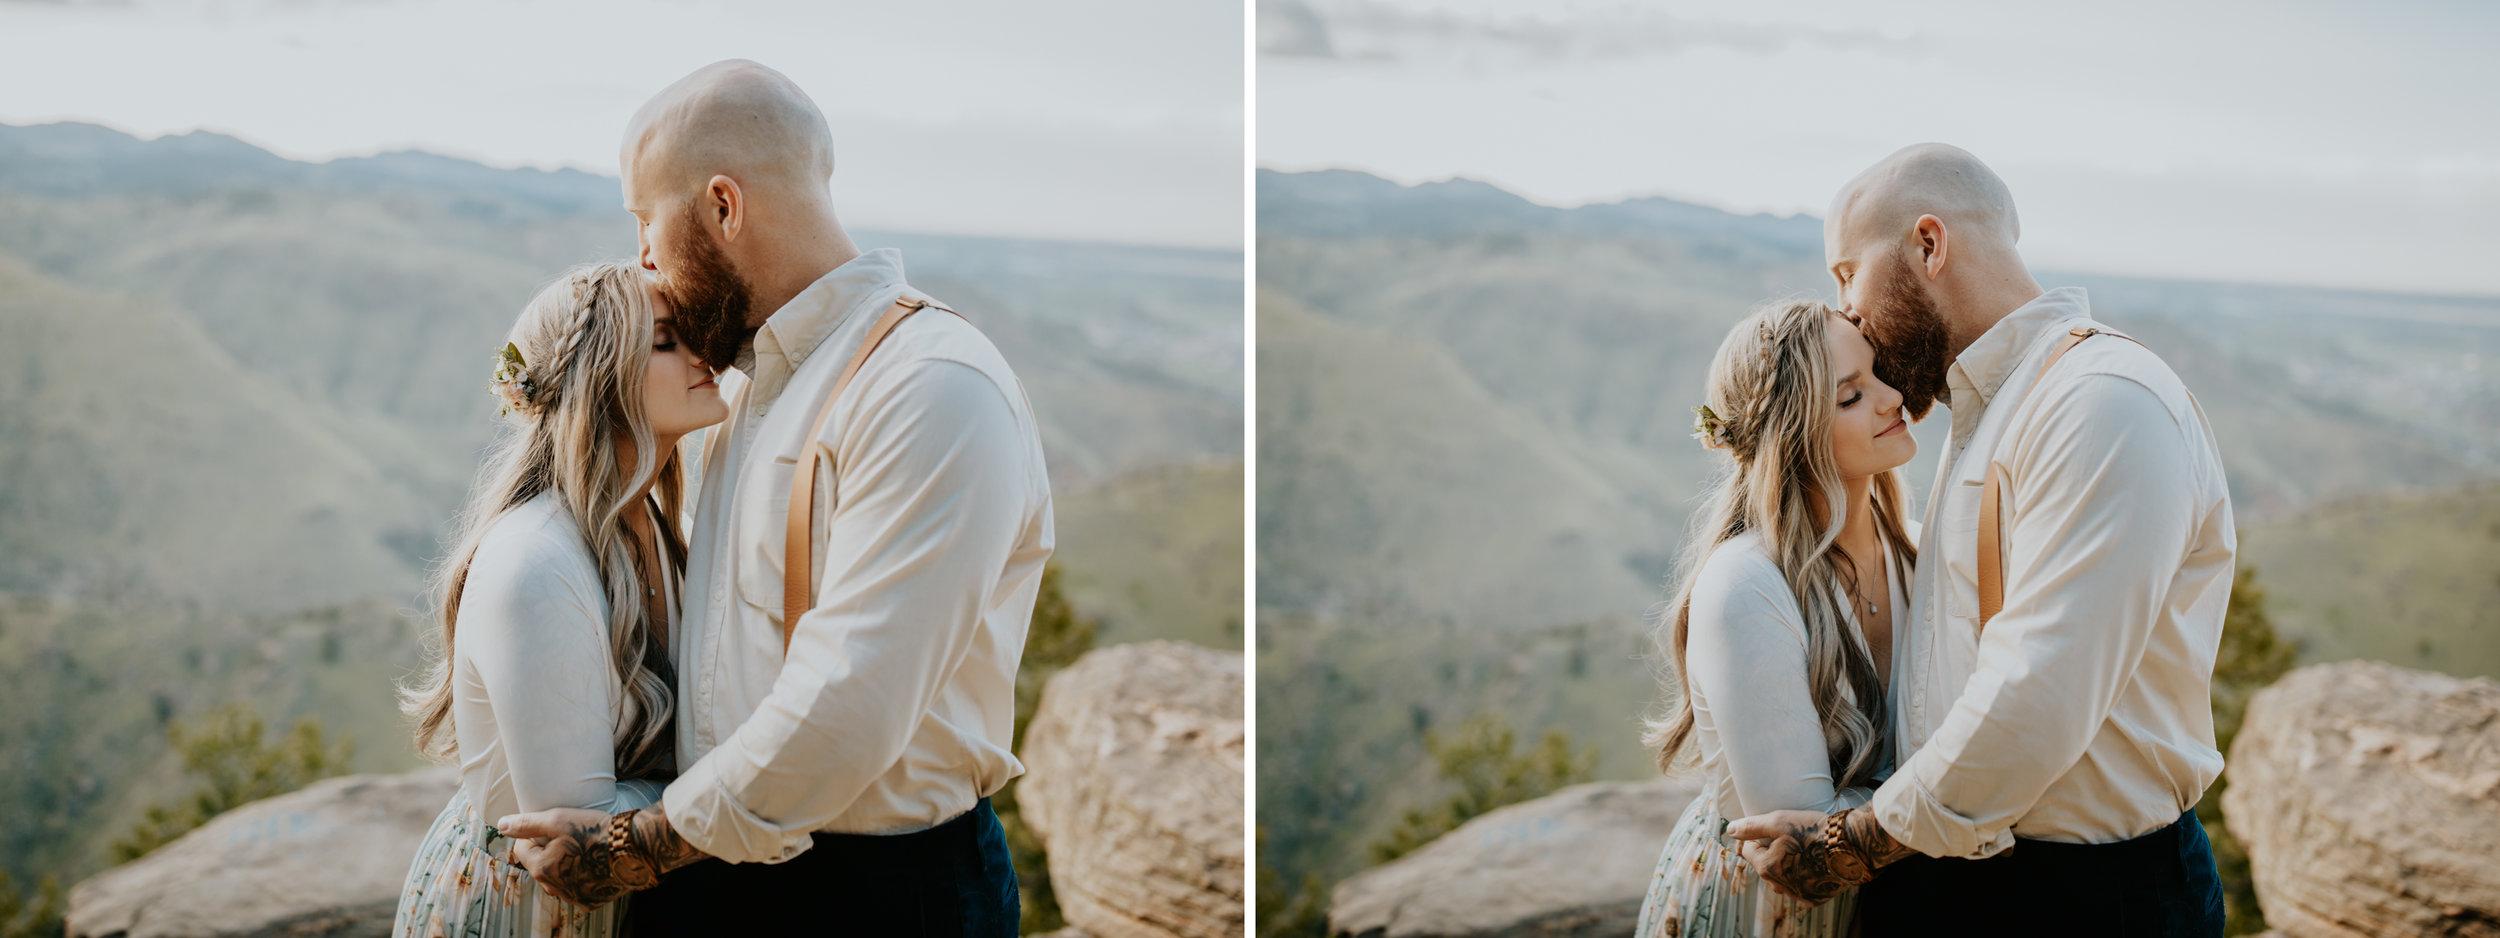 Lookout mountain engagement session denver colorado photographer 14.jpg